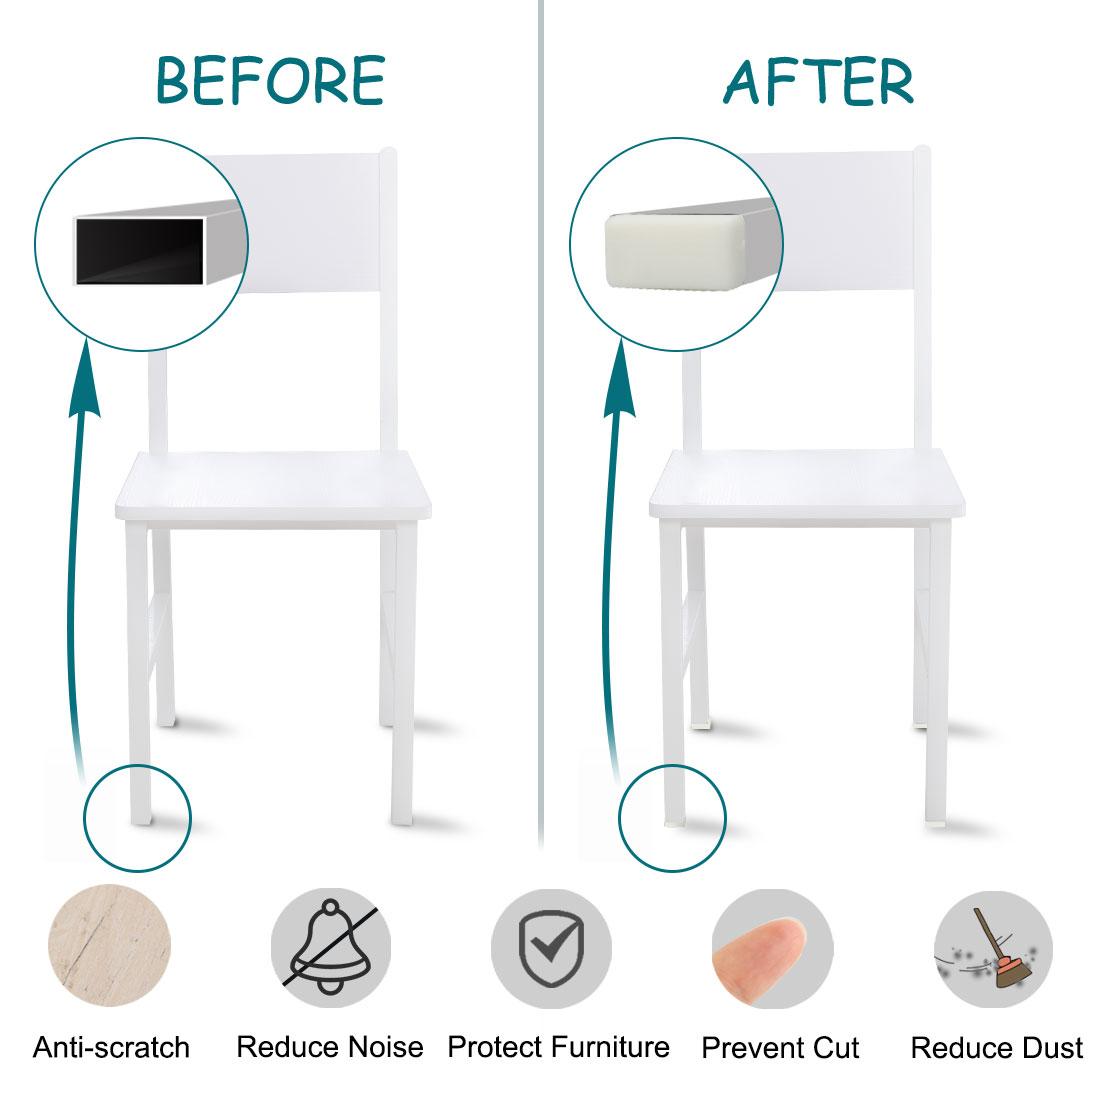 20 x 10mm Rectangle Tube Inserts Feet Cap Furniture Legs Floor Protector 20pcs - image 5 of 7